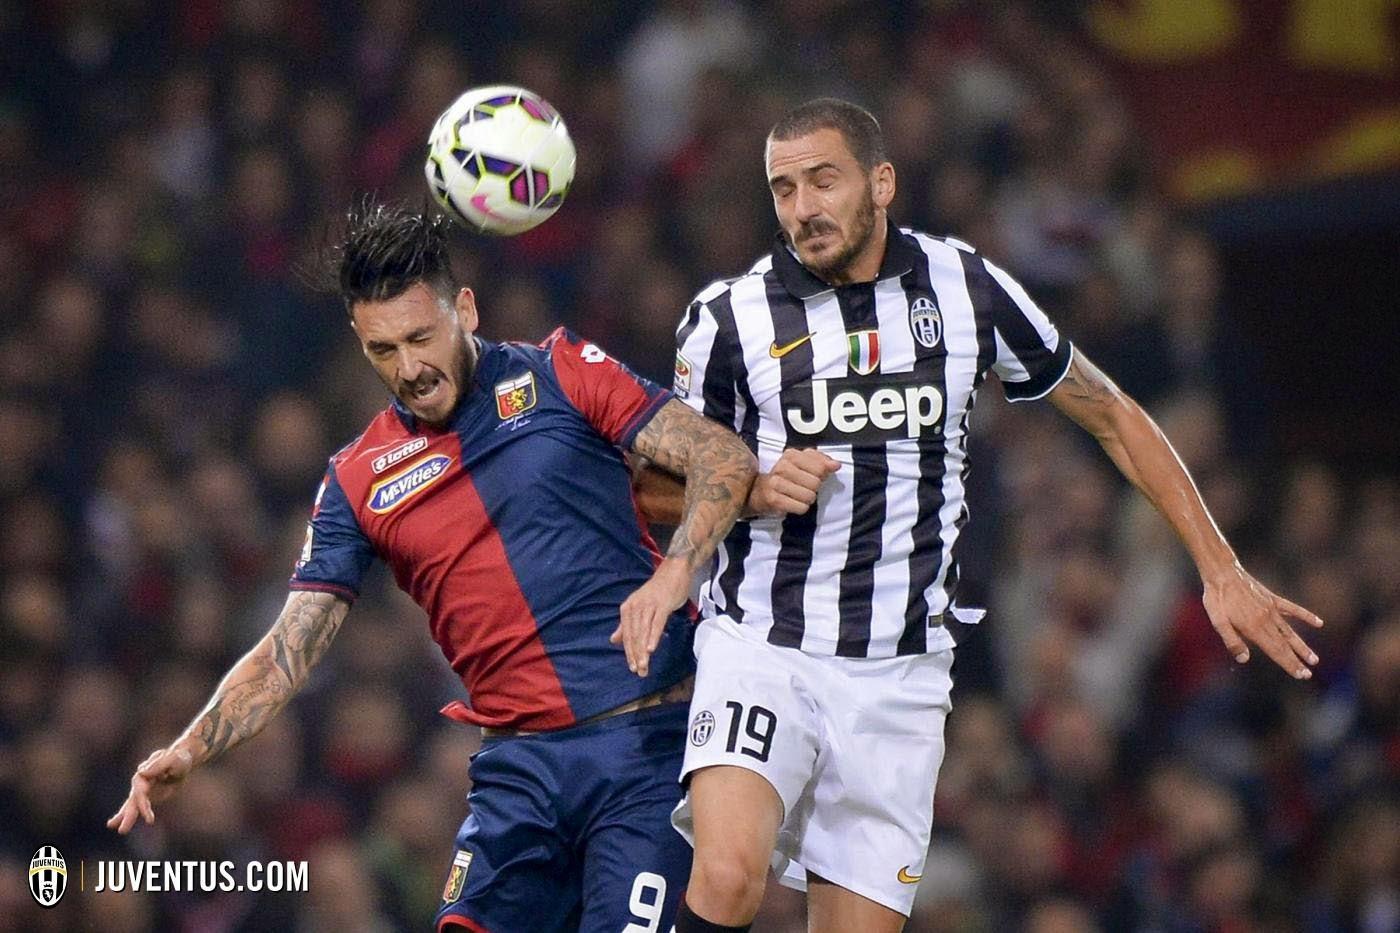 CALCIO Genoa-Juventus 1-0, non basta dominare